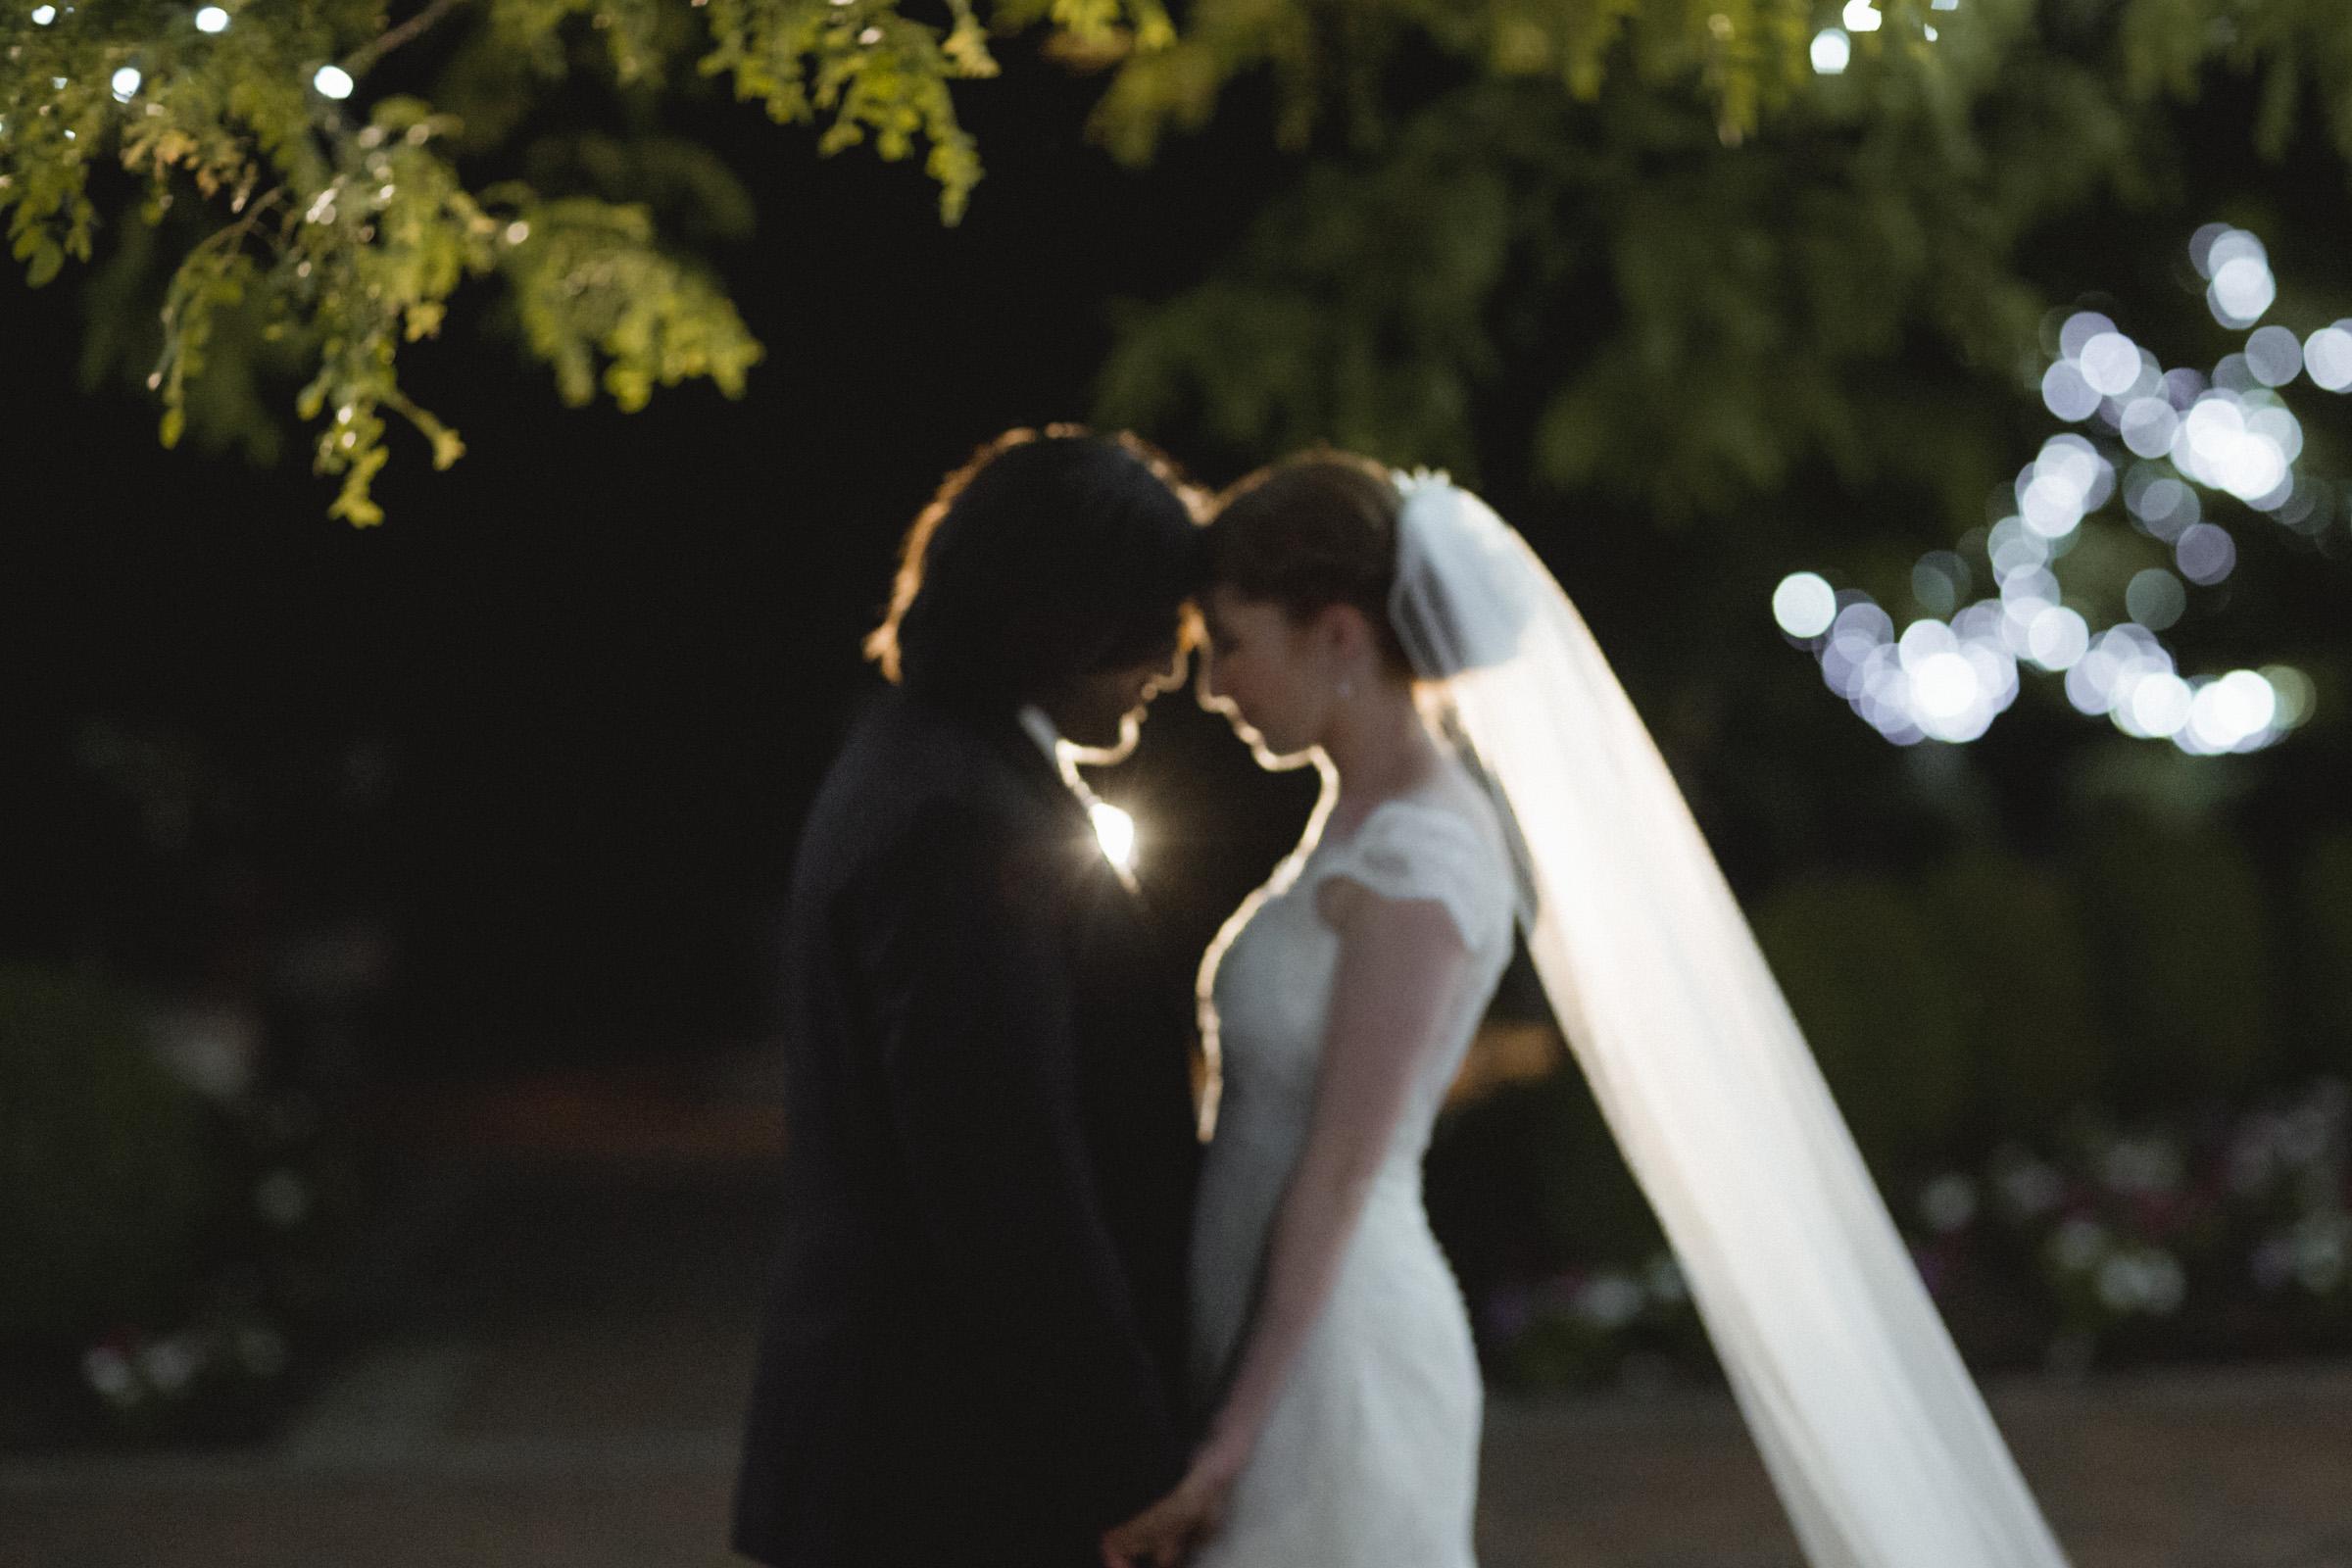 Night Portrait of Couple - Estate at Florentine Gardens wedding - Hudson Valley Wedding - Kelsey & Anish's wedding - Amy Sims Photography